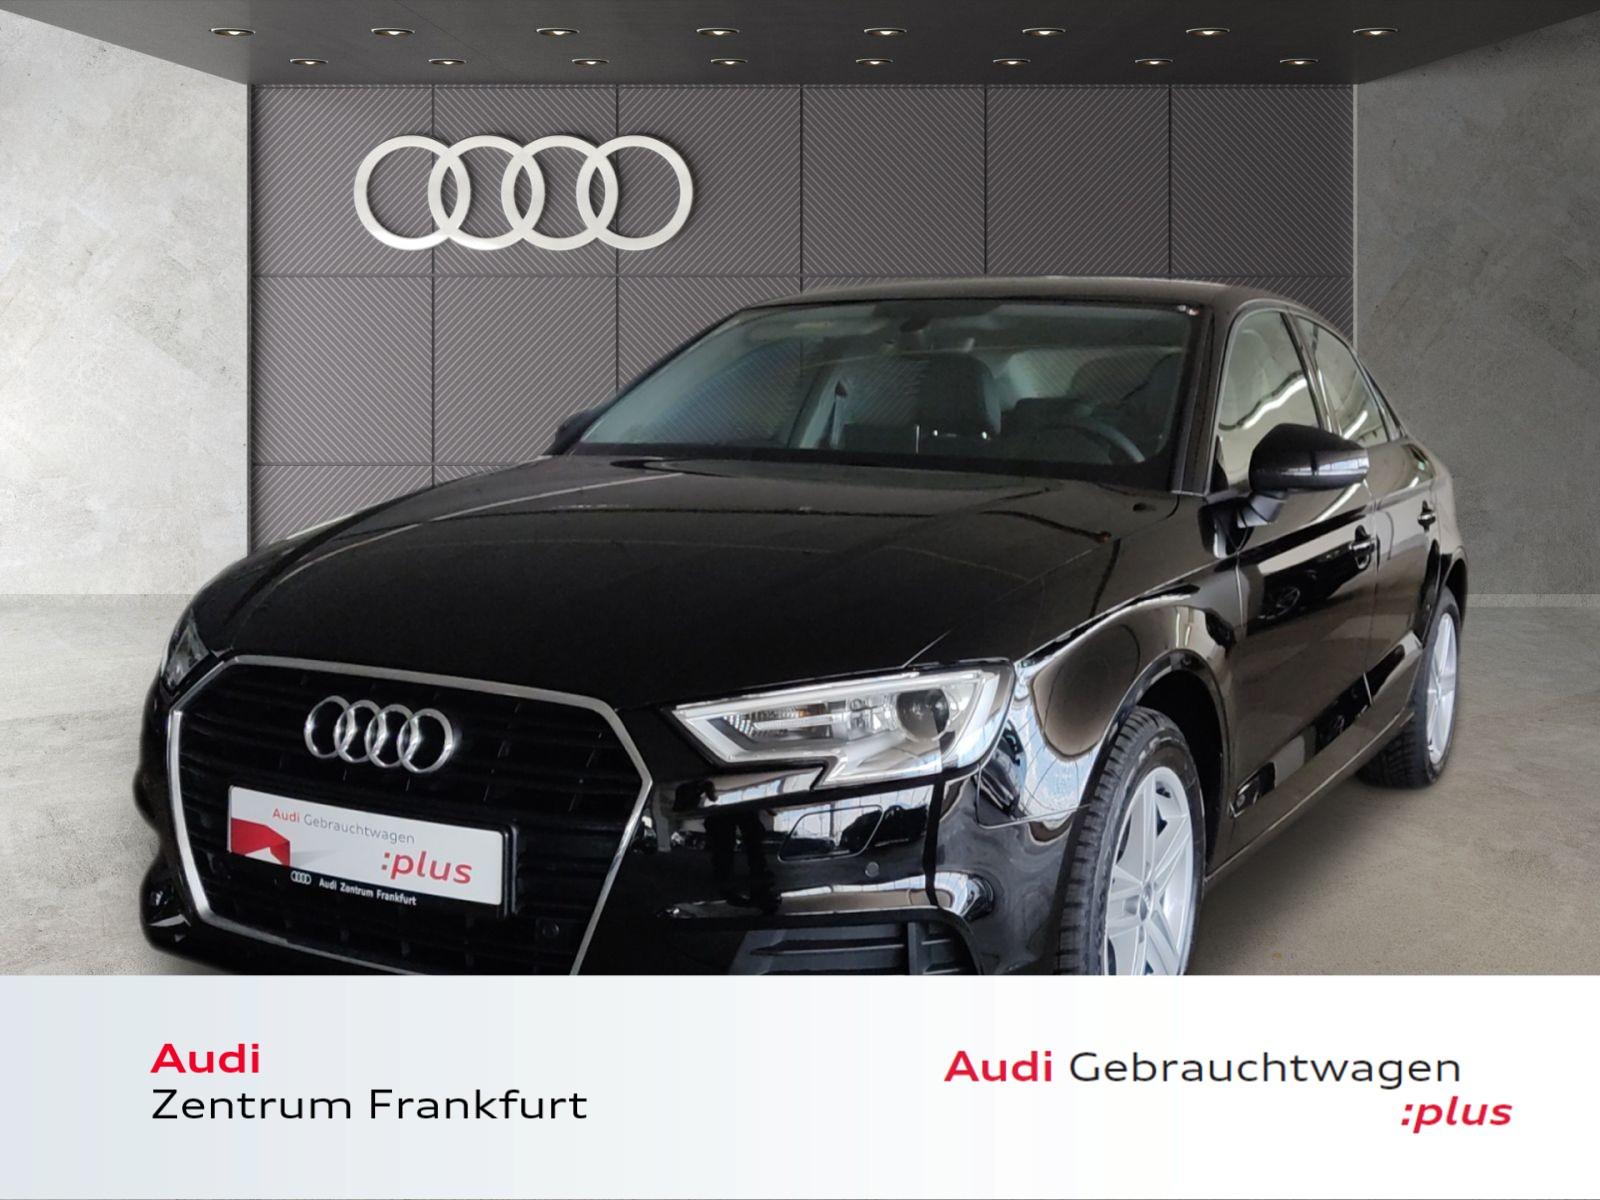 Audi A3 Limousine 1.0 TFSI S tronic Navi Xenon PDC Sitzheizung, Jahr 2019, Benzin